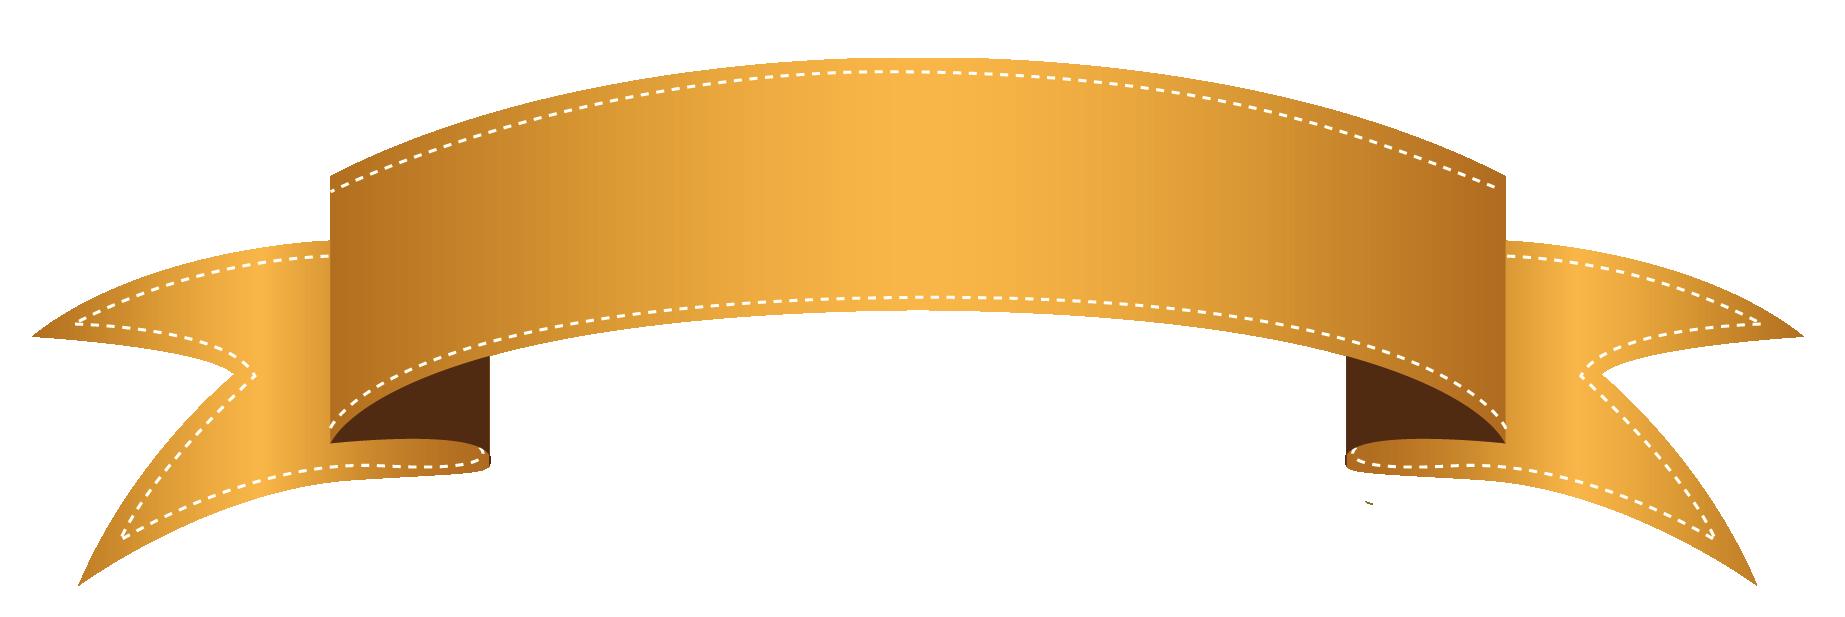 Clipart banner. Orange transparent png gallery